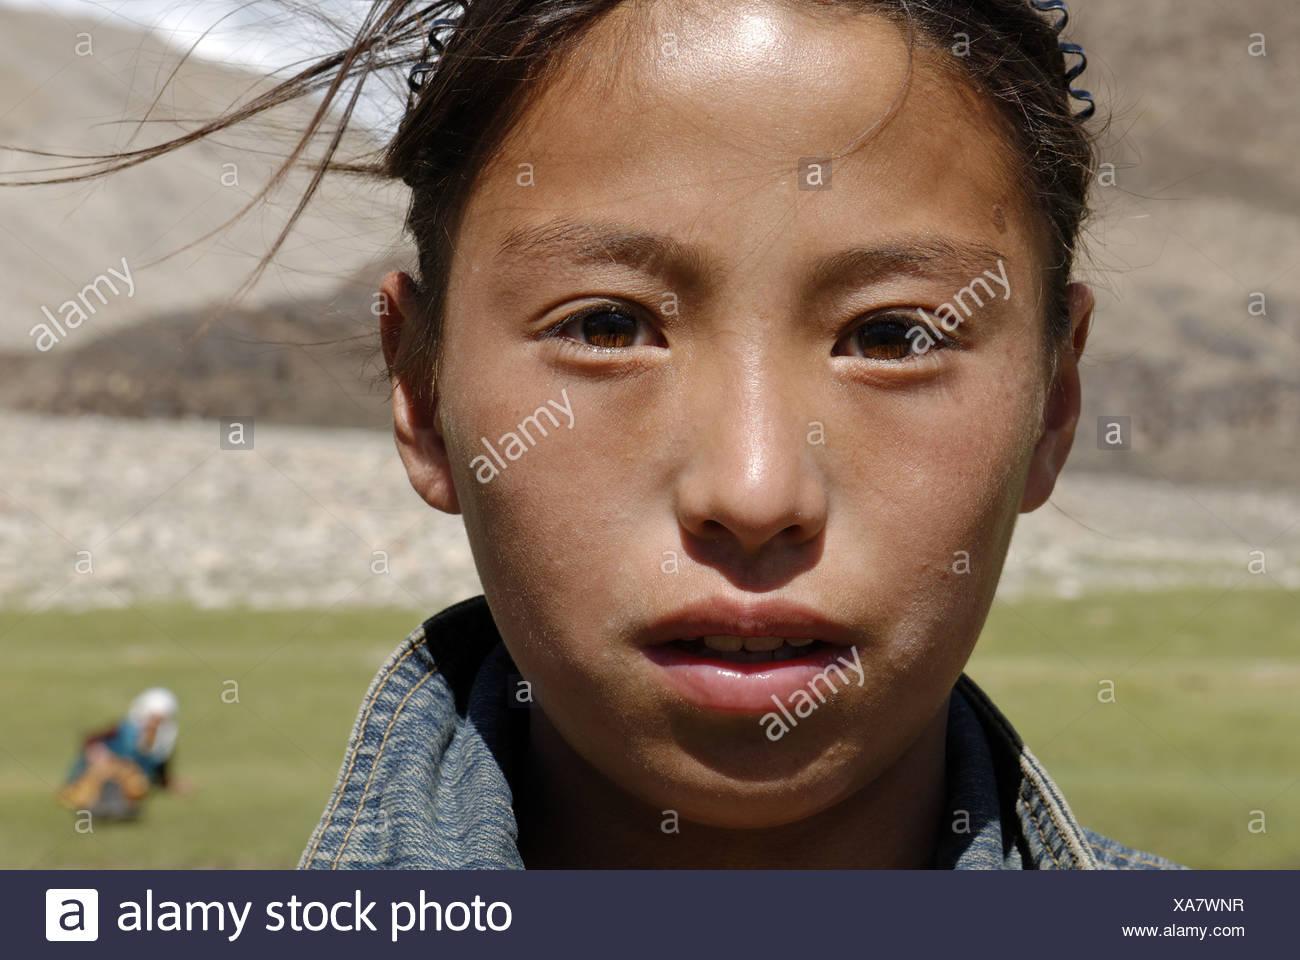 Kazakhstan girls images